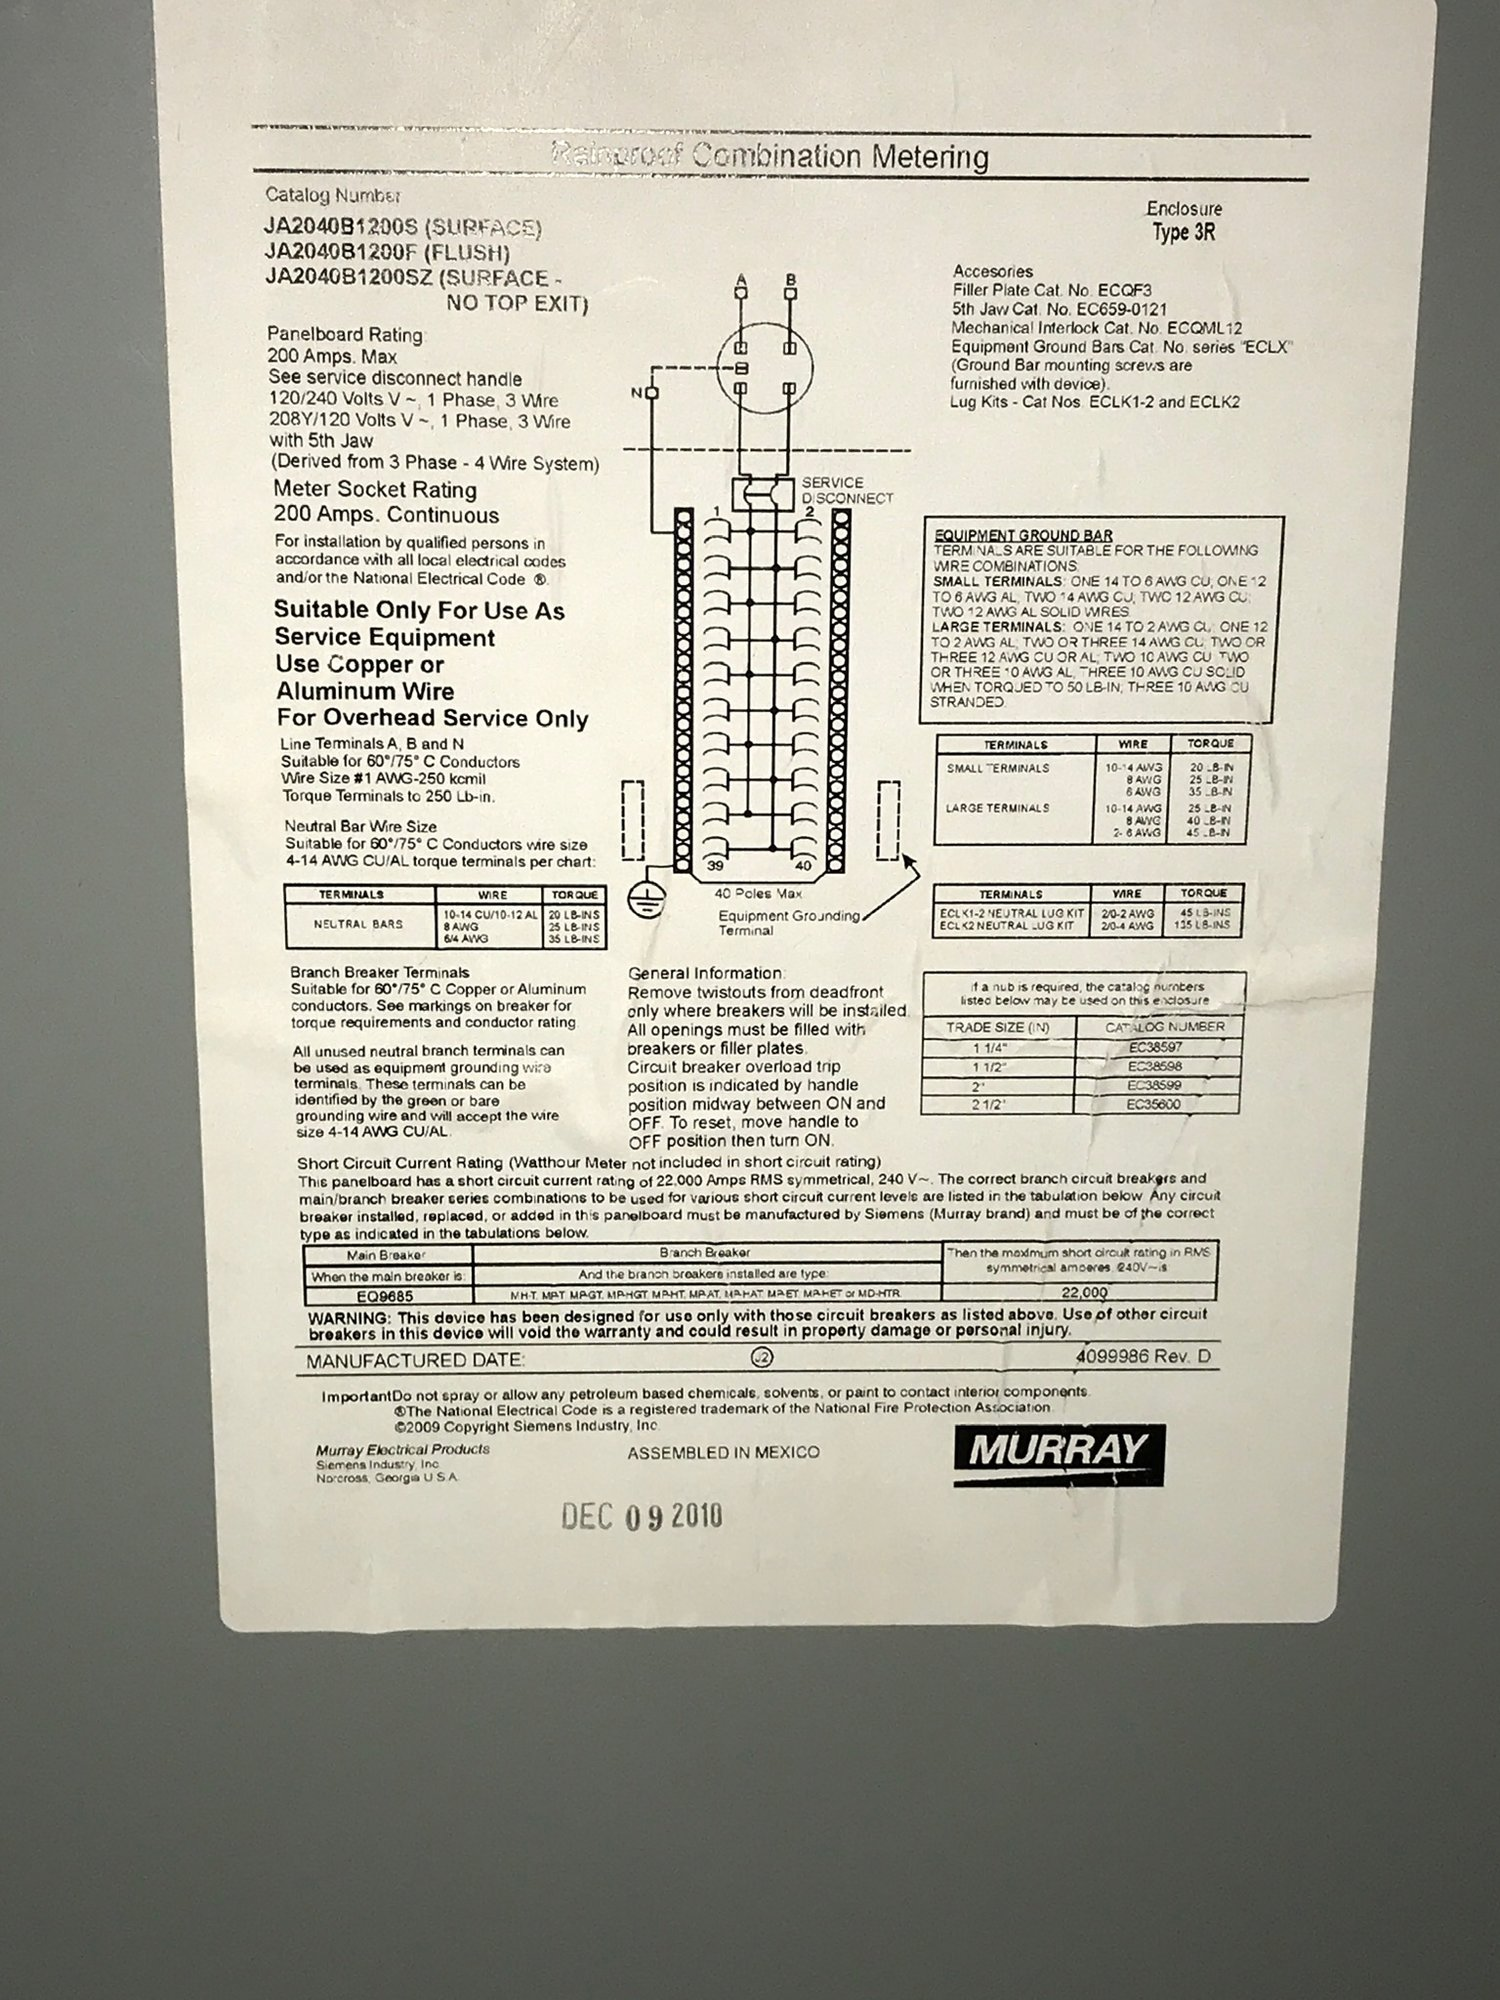 9F1538EC-005F-40A3-B5E9-D3043B983E63.jpeg